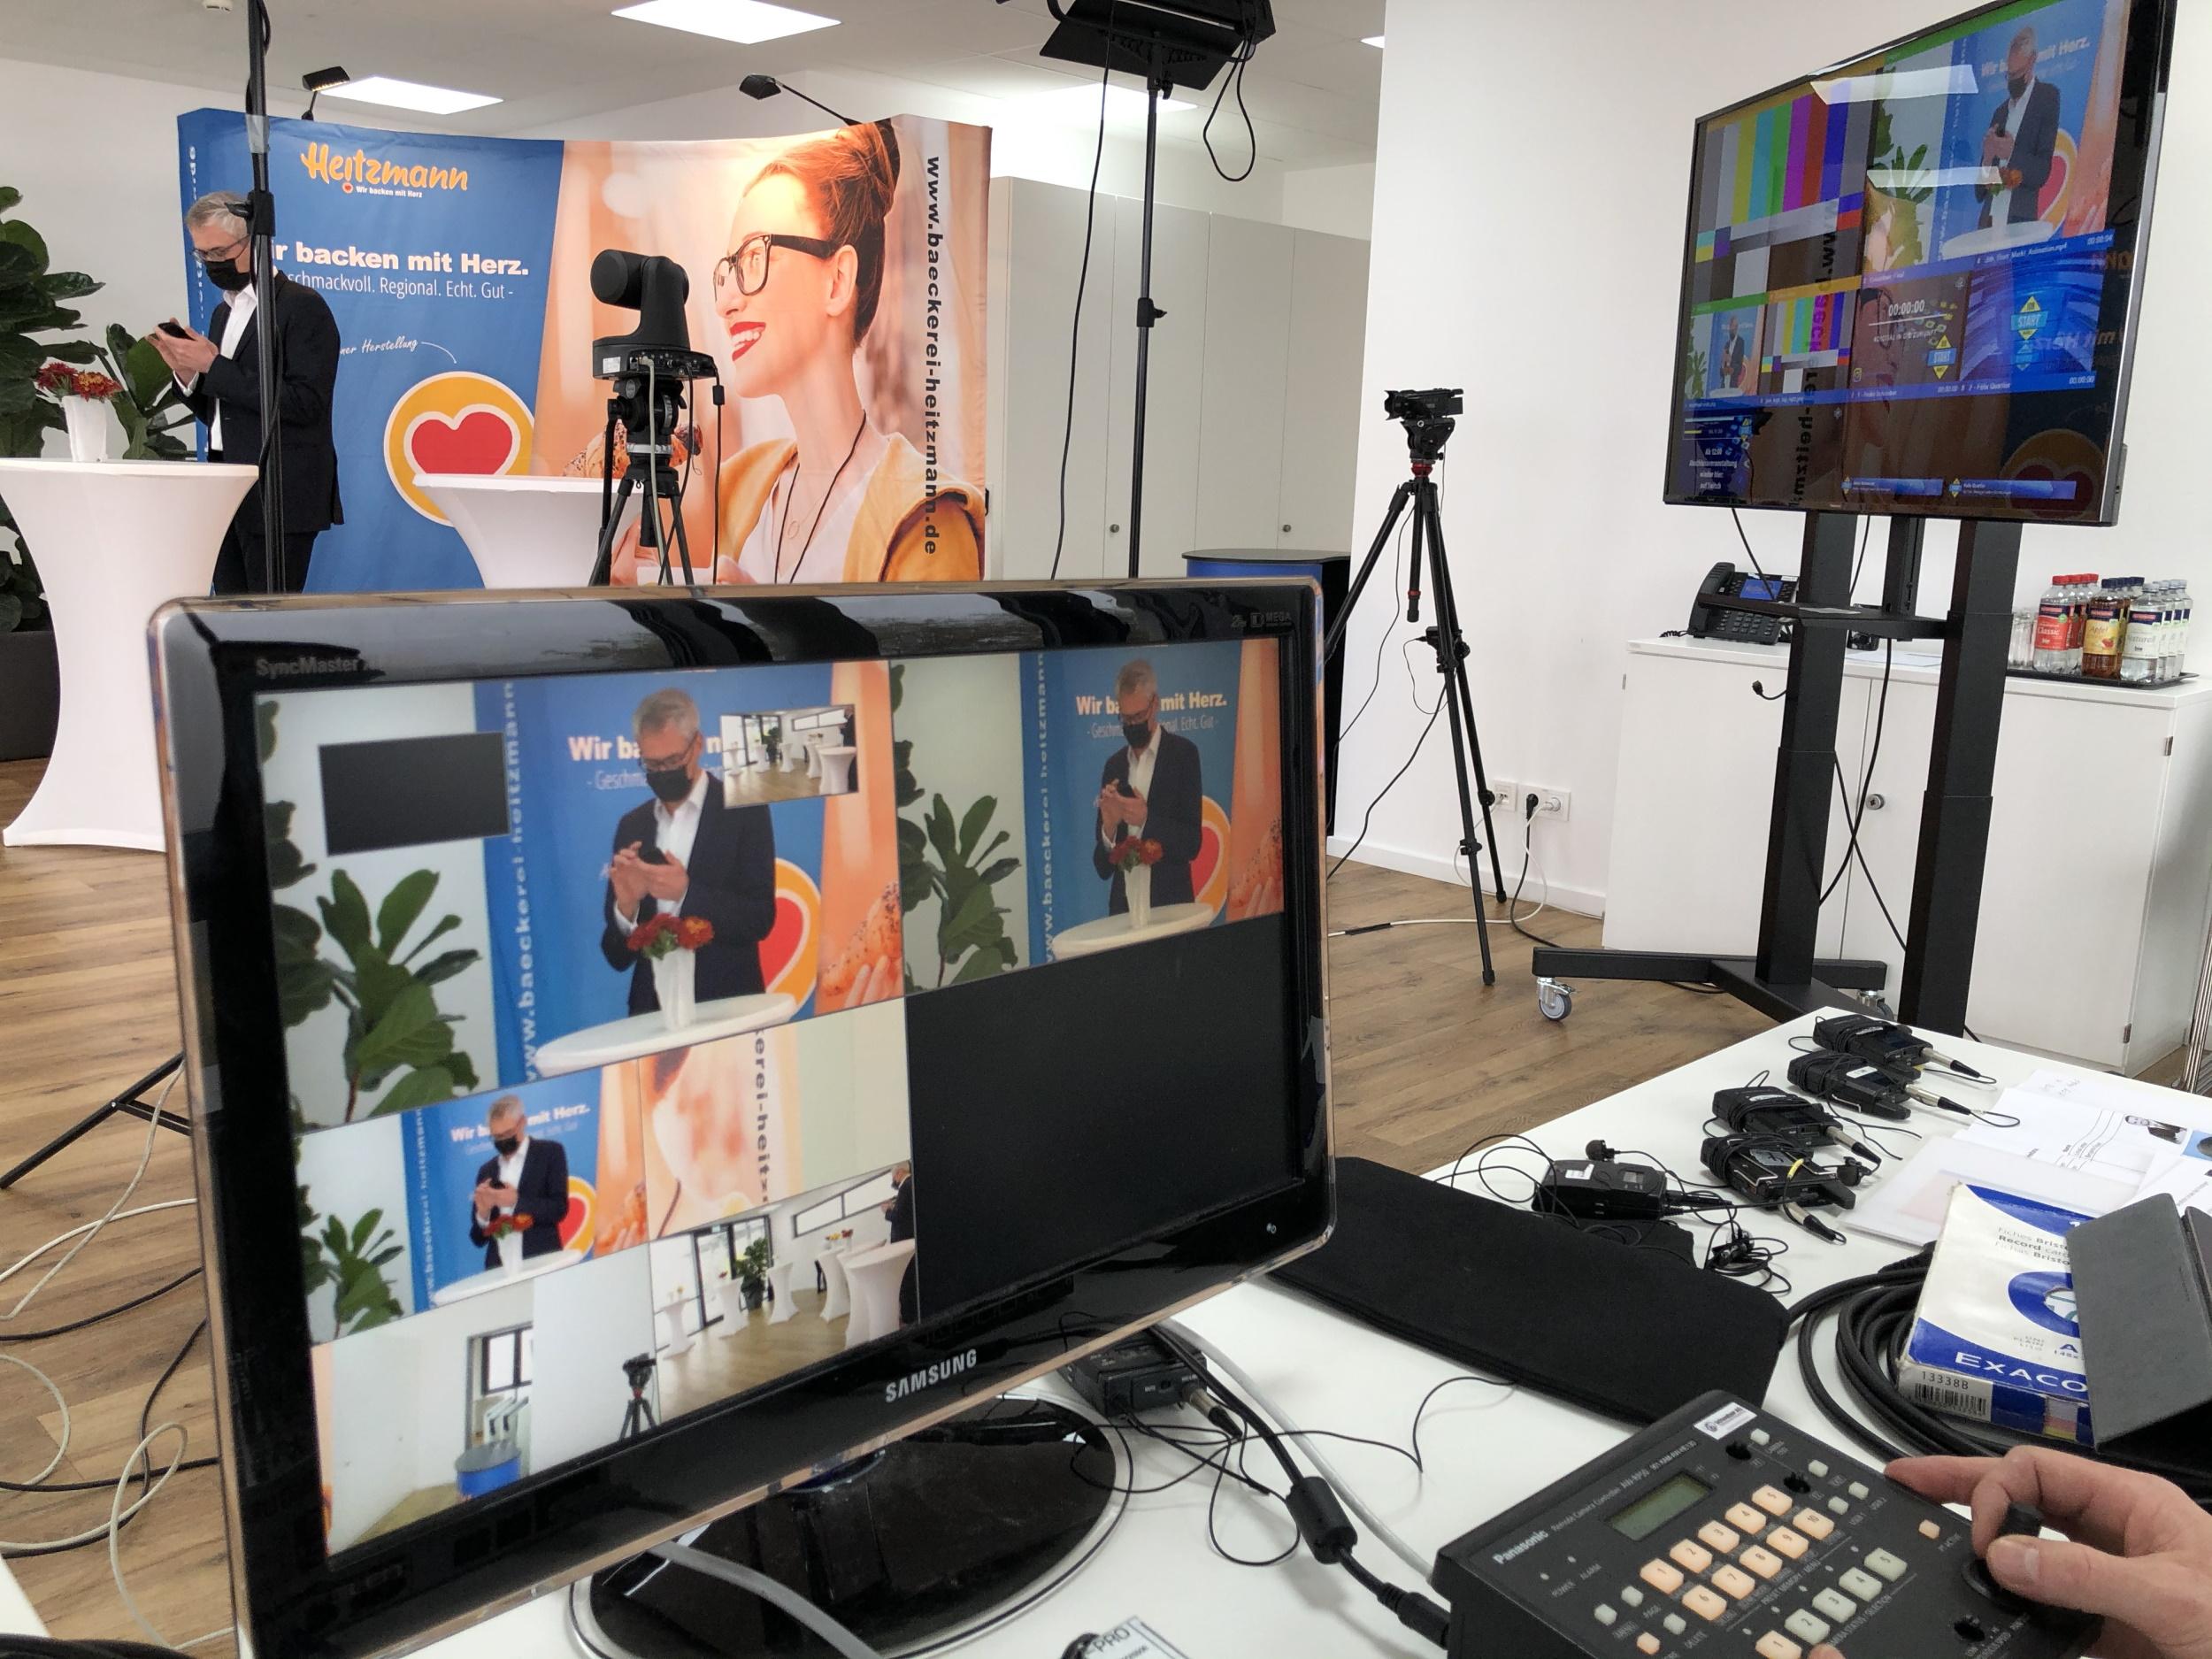 Live Streaming Podiumsdiskussion JobStartMarkt 3